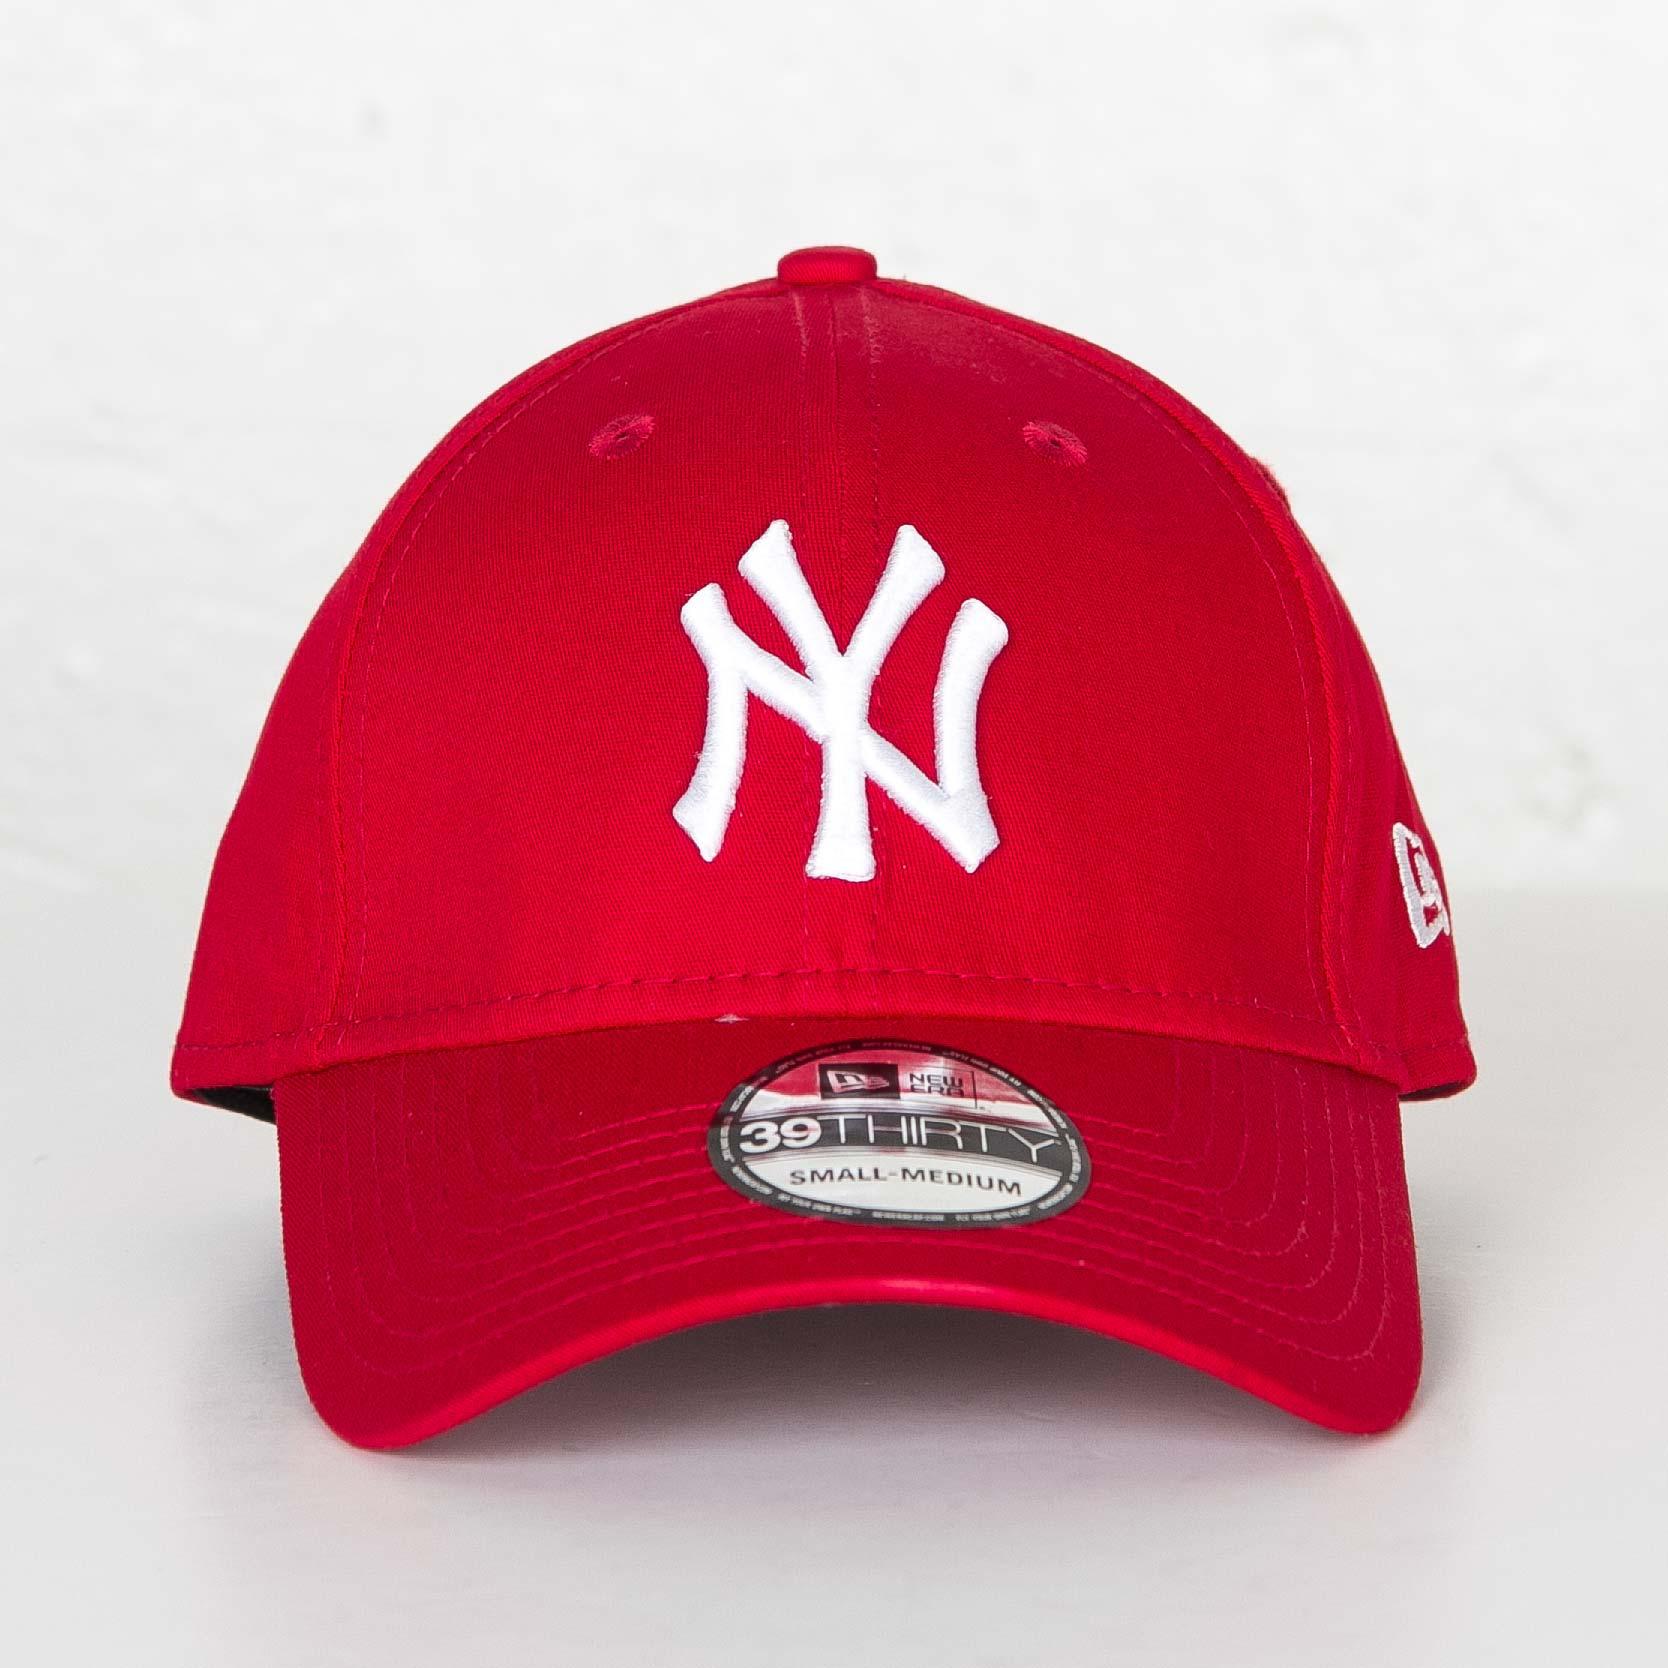 New Era 39Thirty League Basic New York Yankees - 10298276-502 ... 7cfe21eedaf